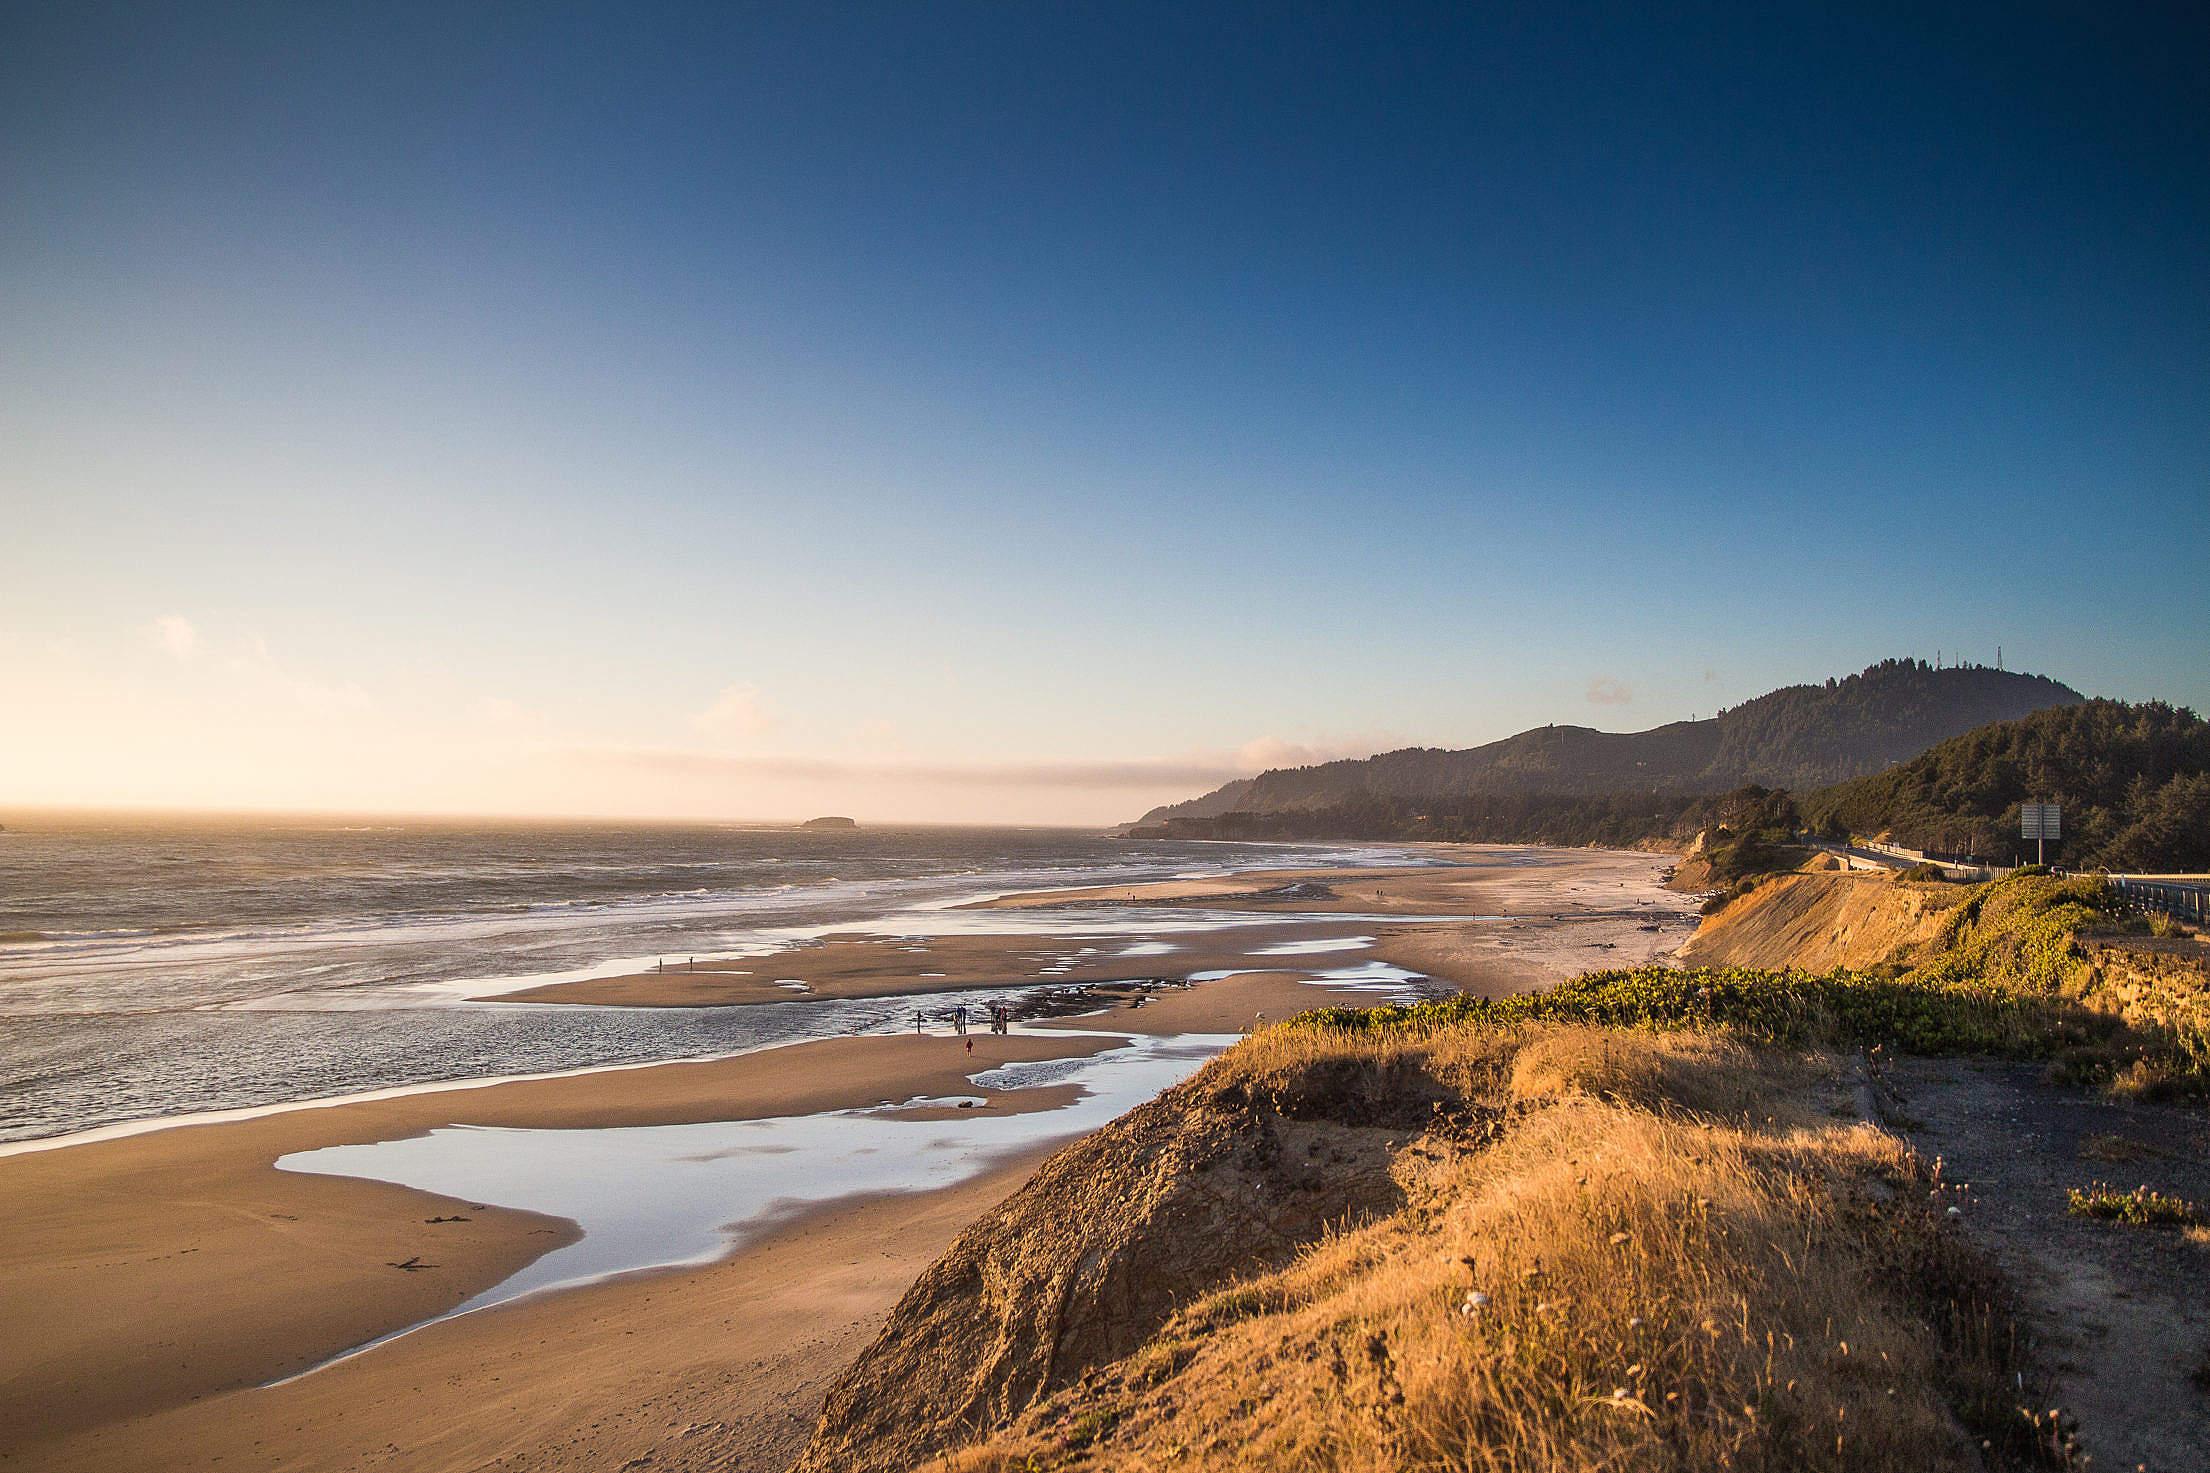 Ocean Coastline in Oregon Free Stock Photo